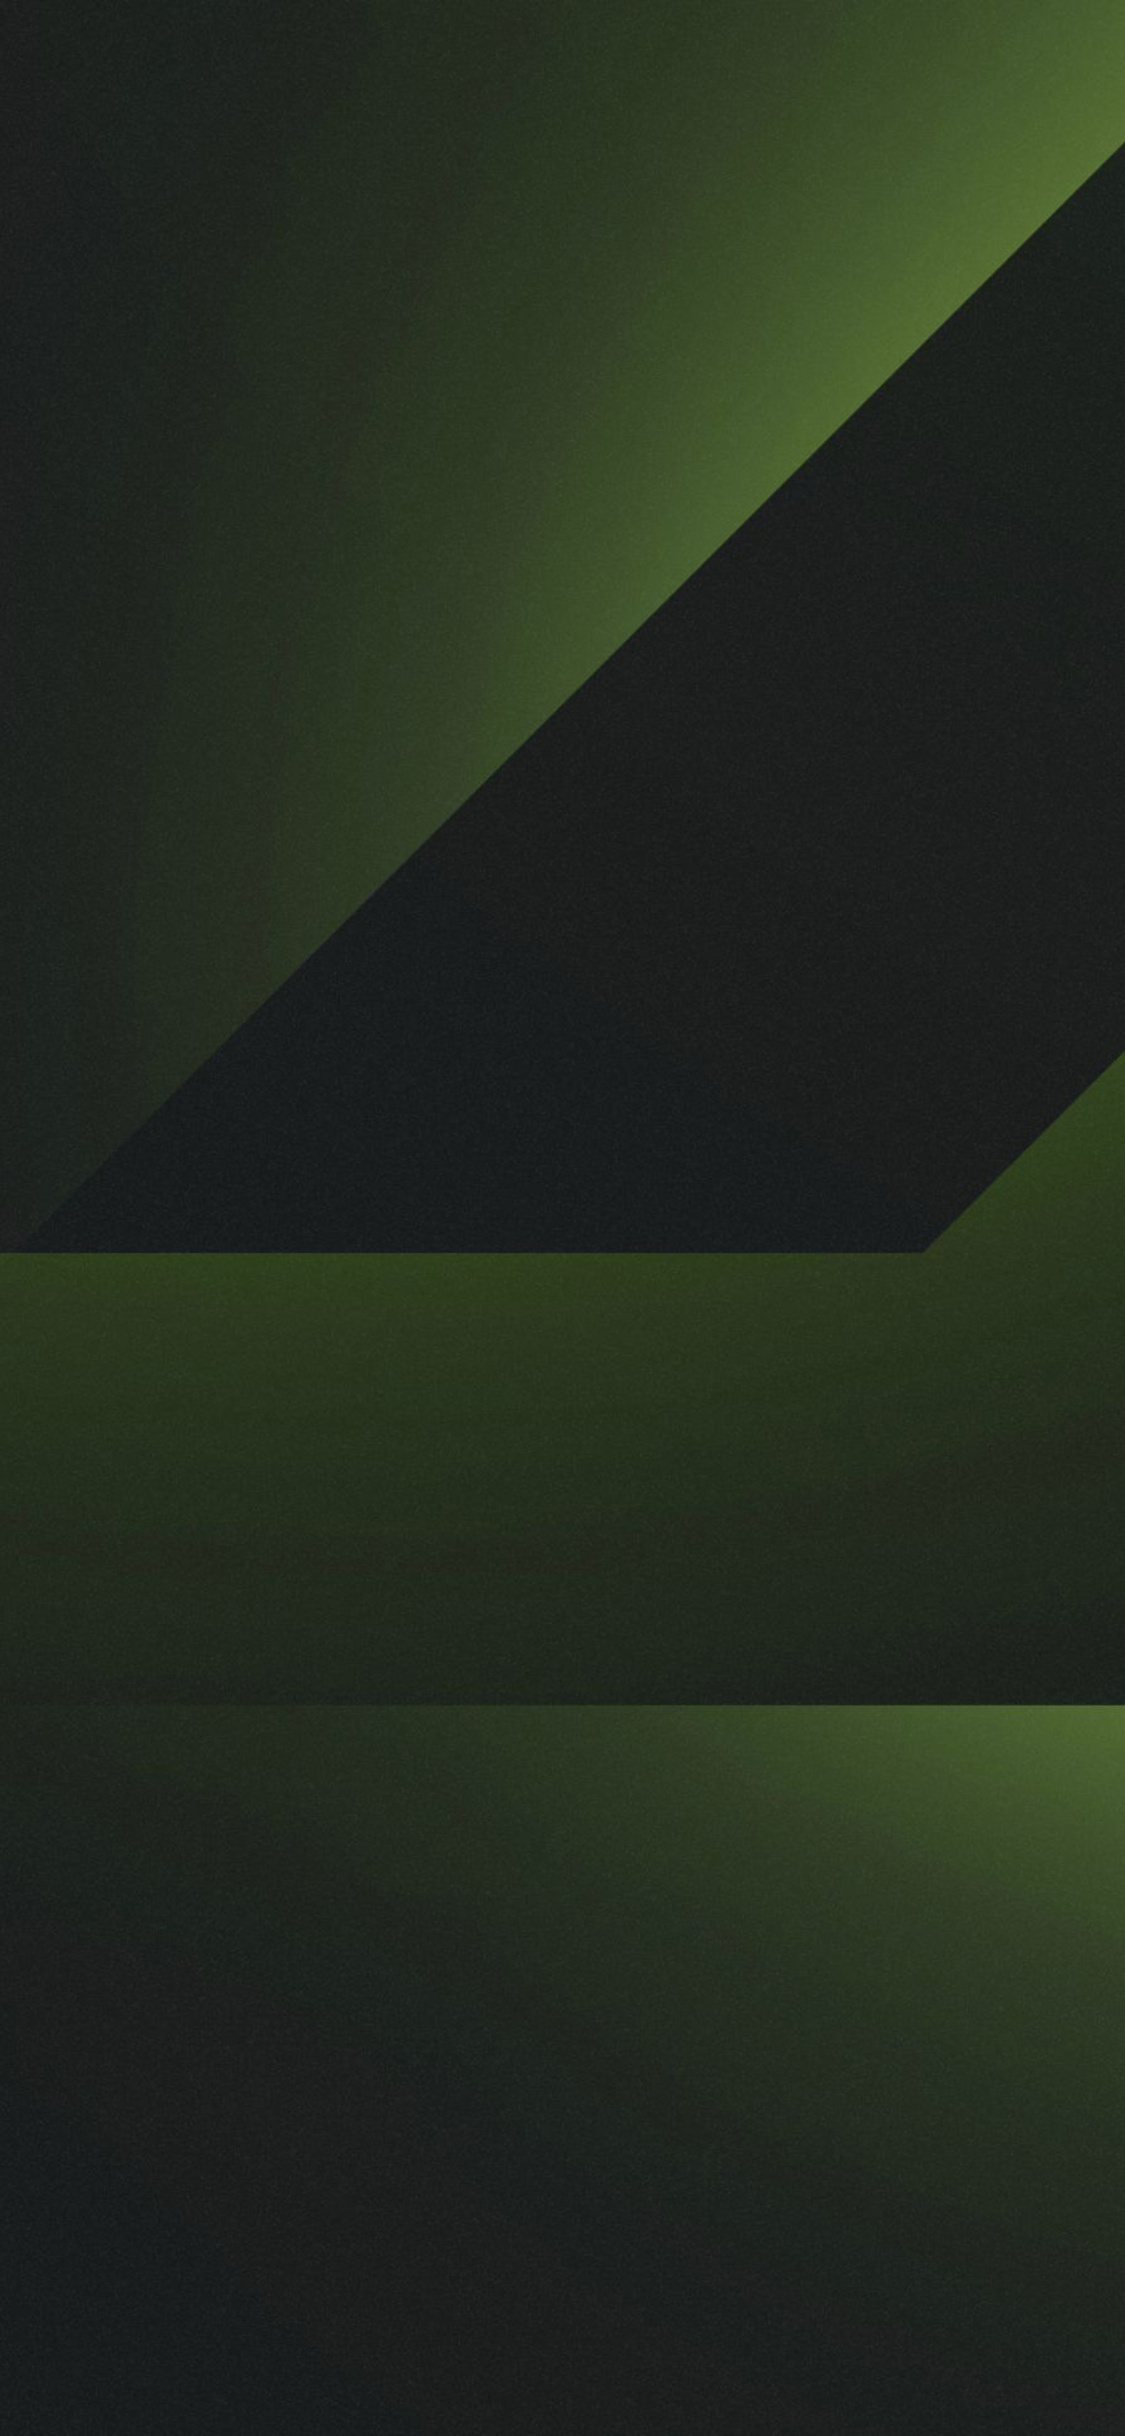 1125x2436 Abstract Dark Green 4k Iphone XS,Iphone 10 ...